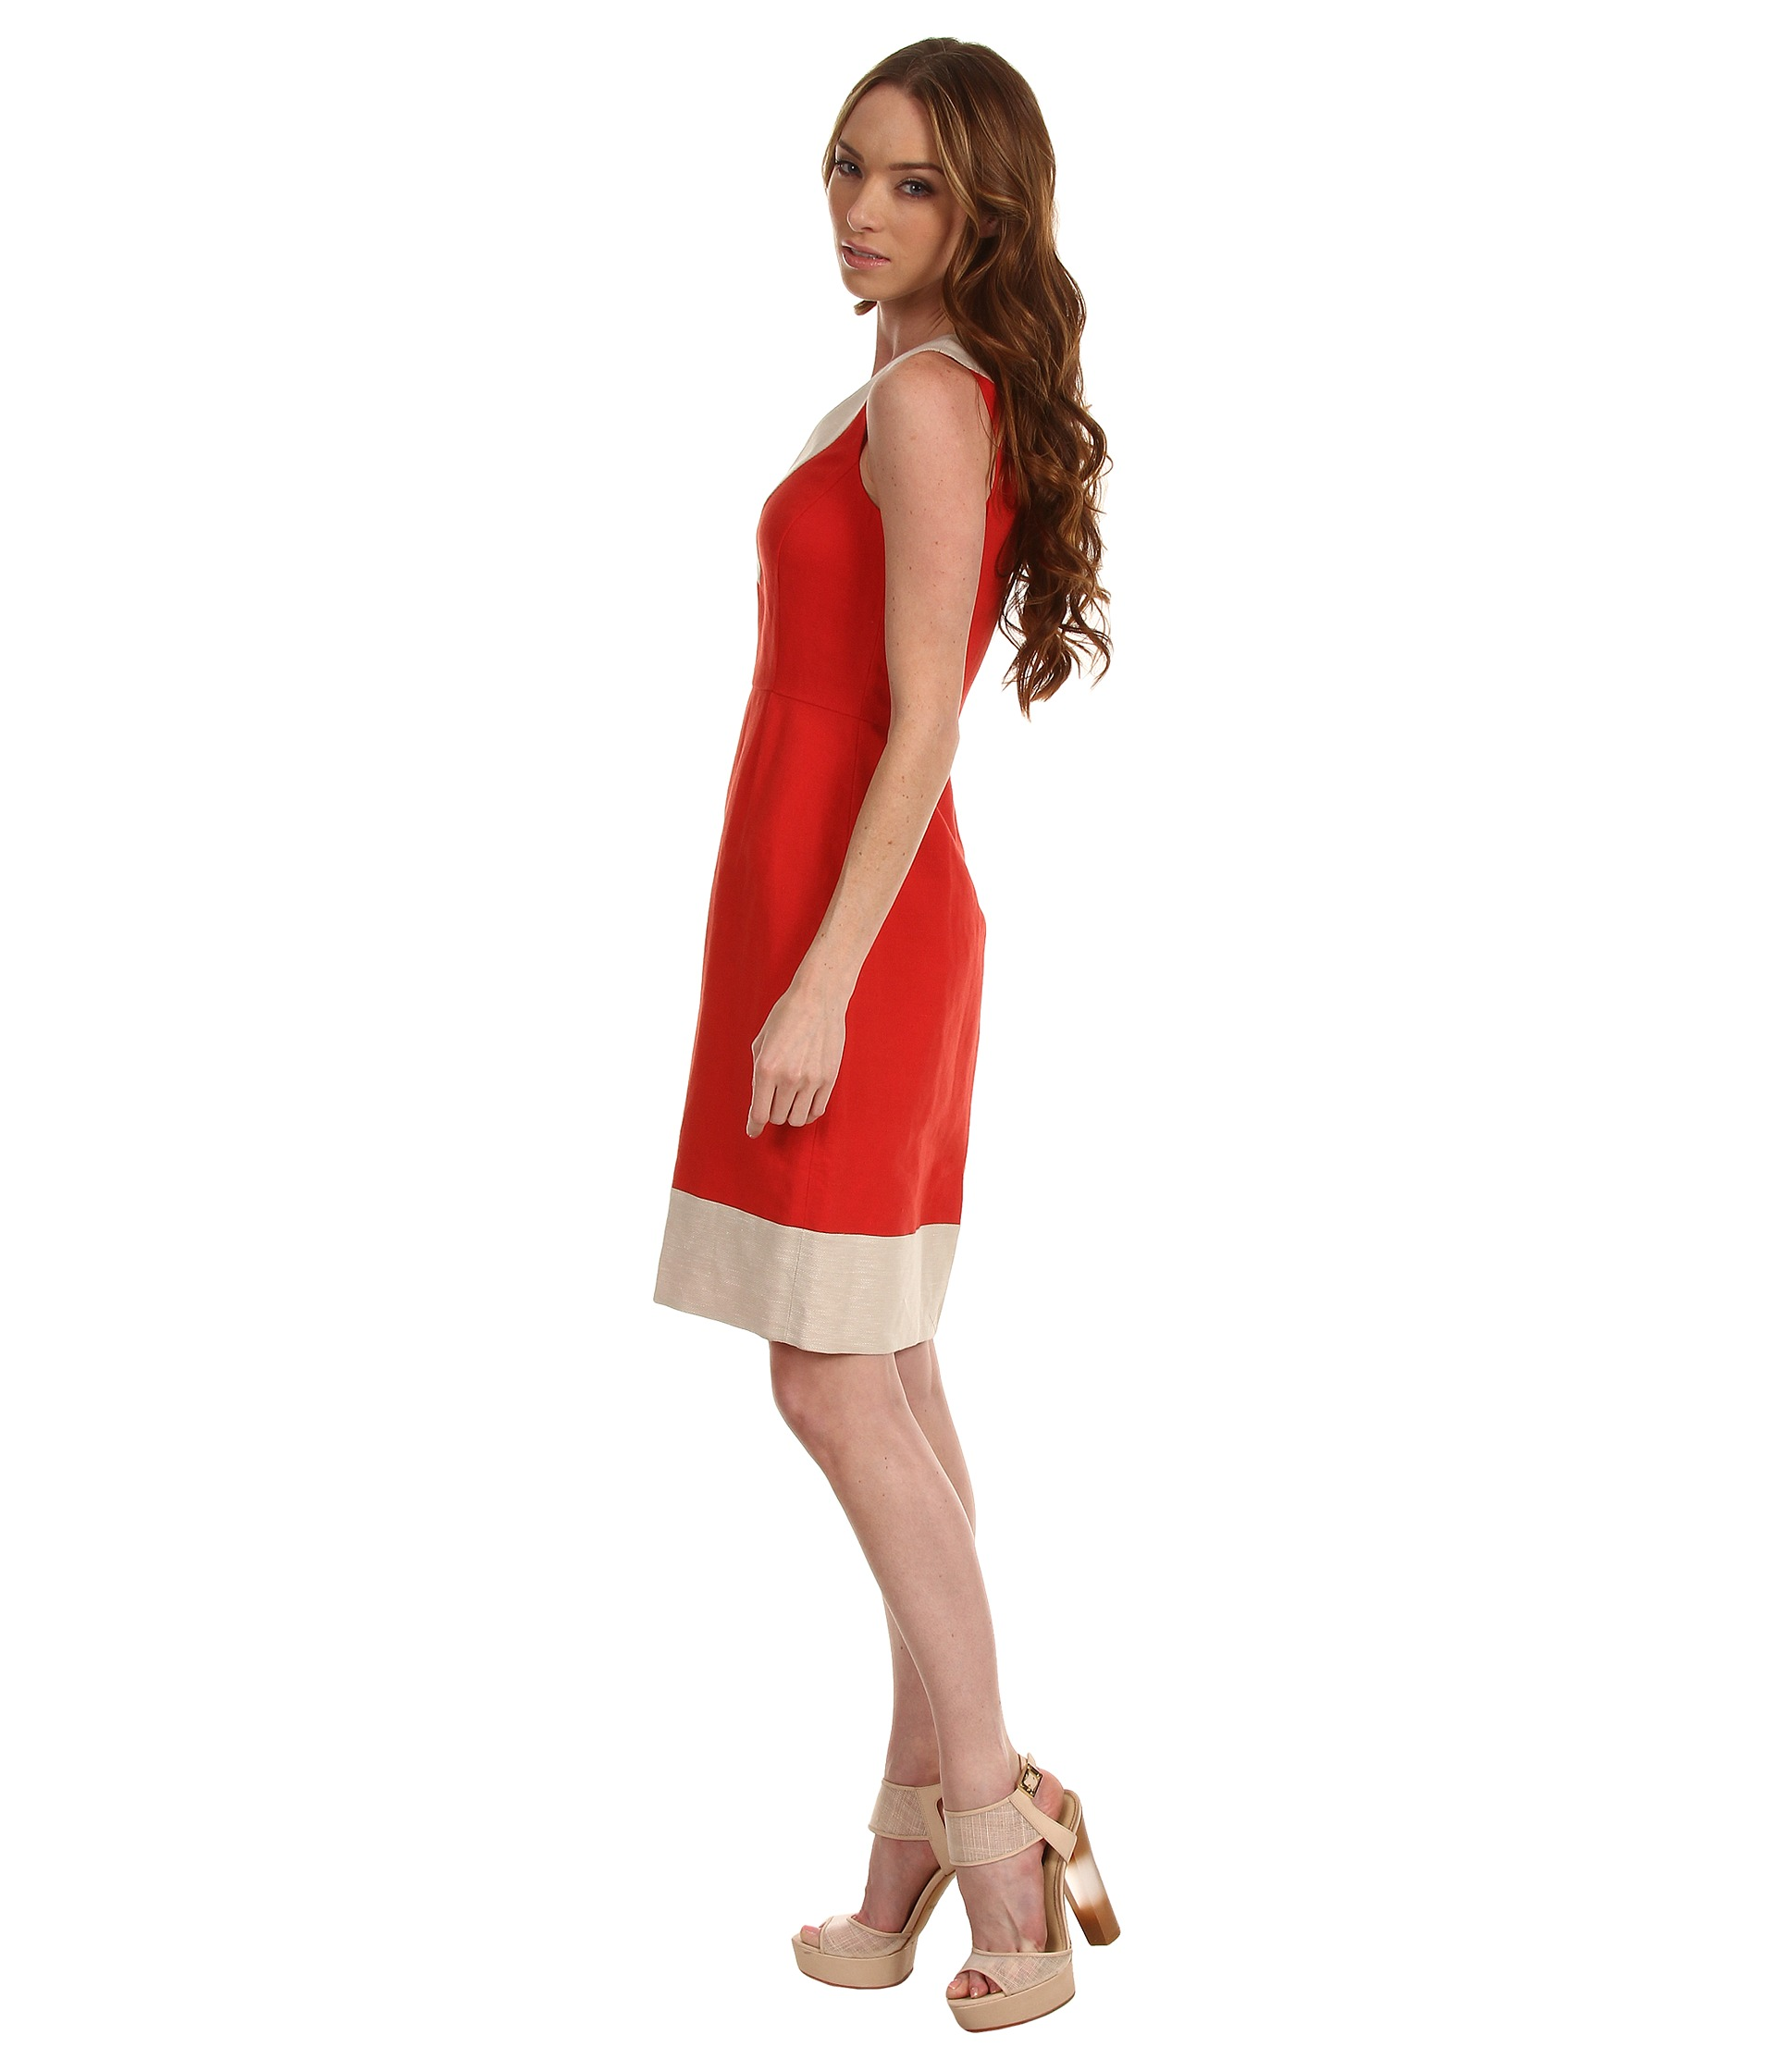 Kate Spade New York James Dress